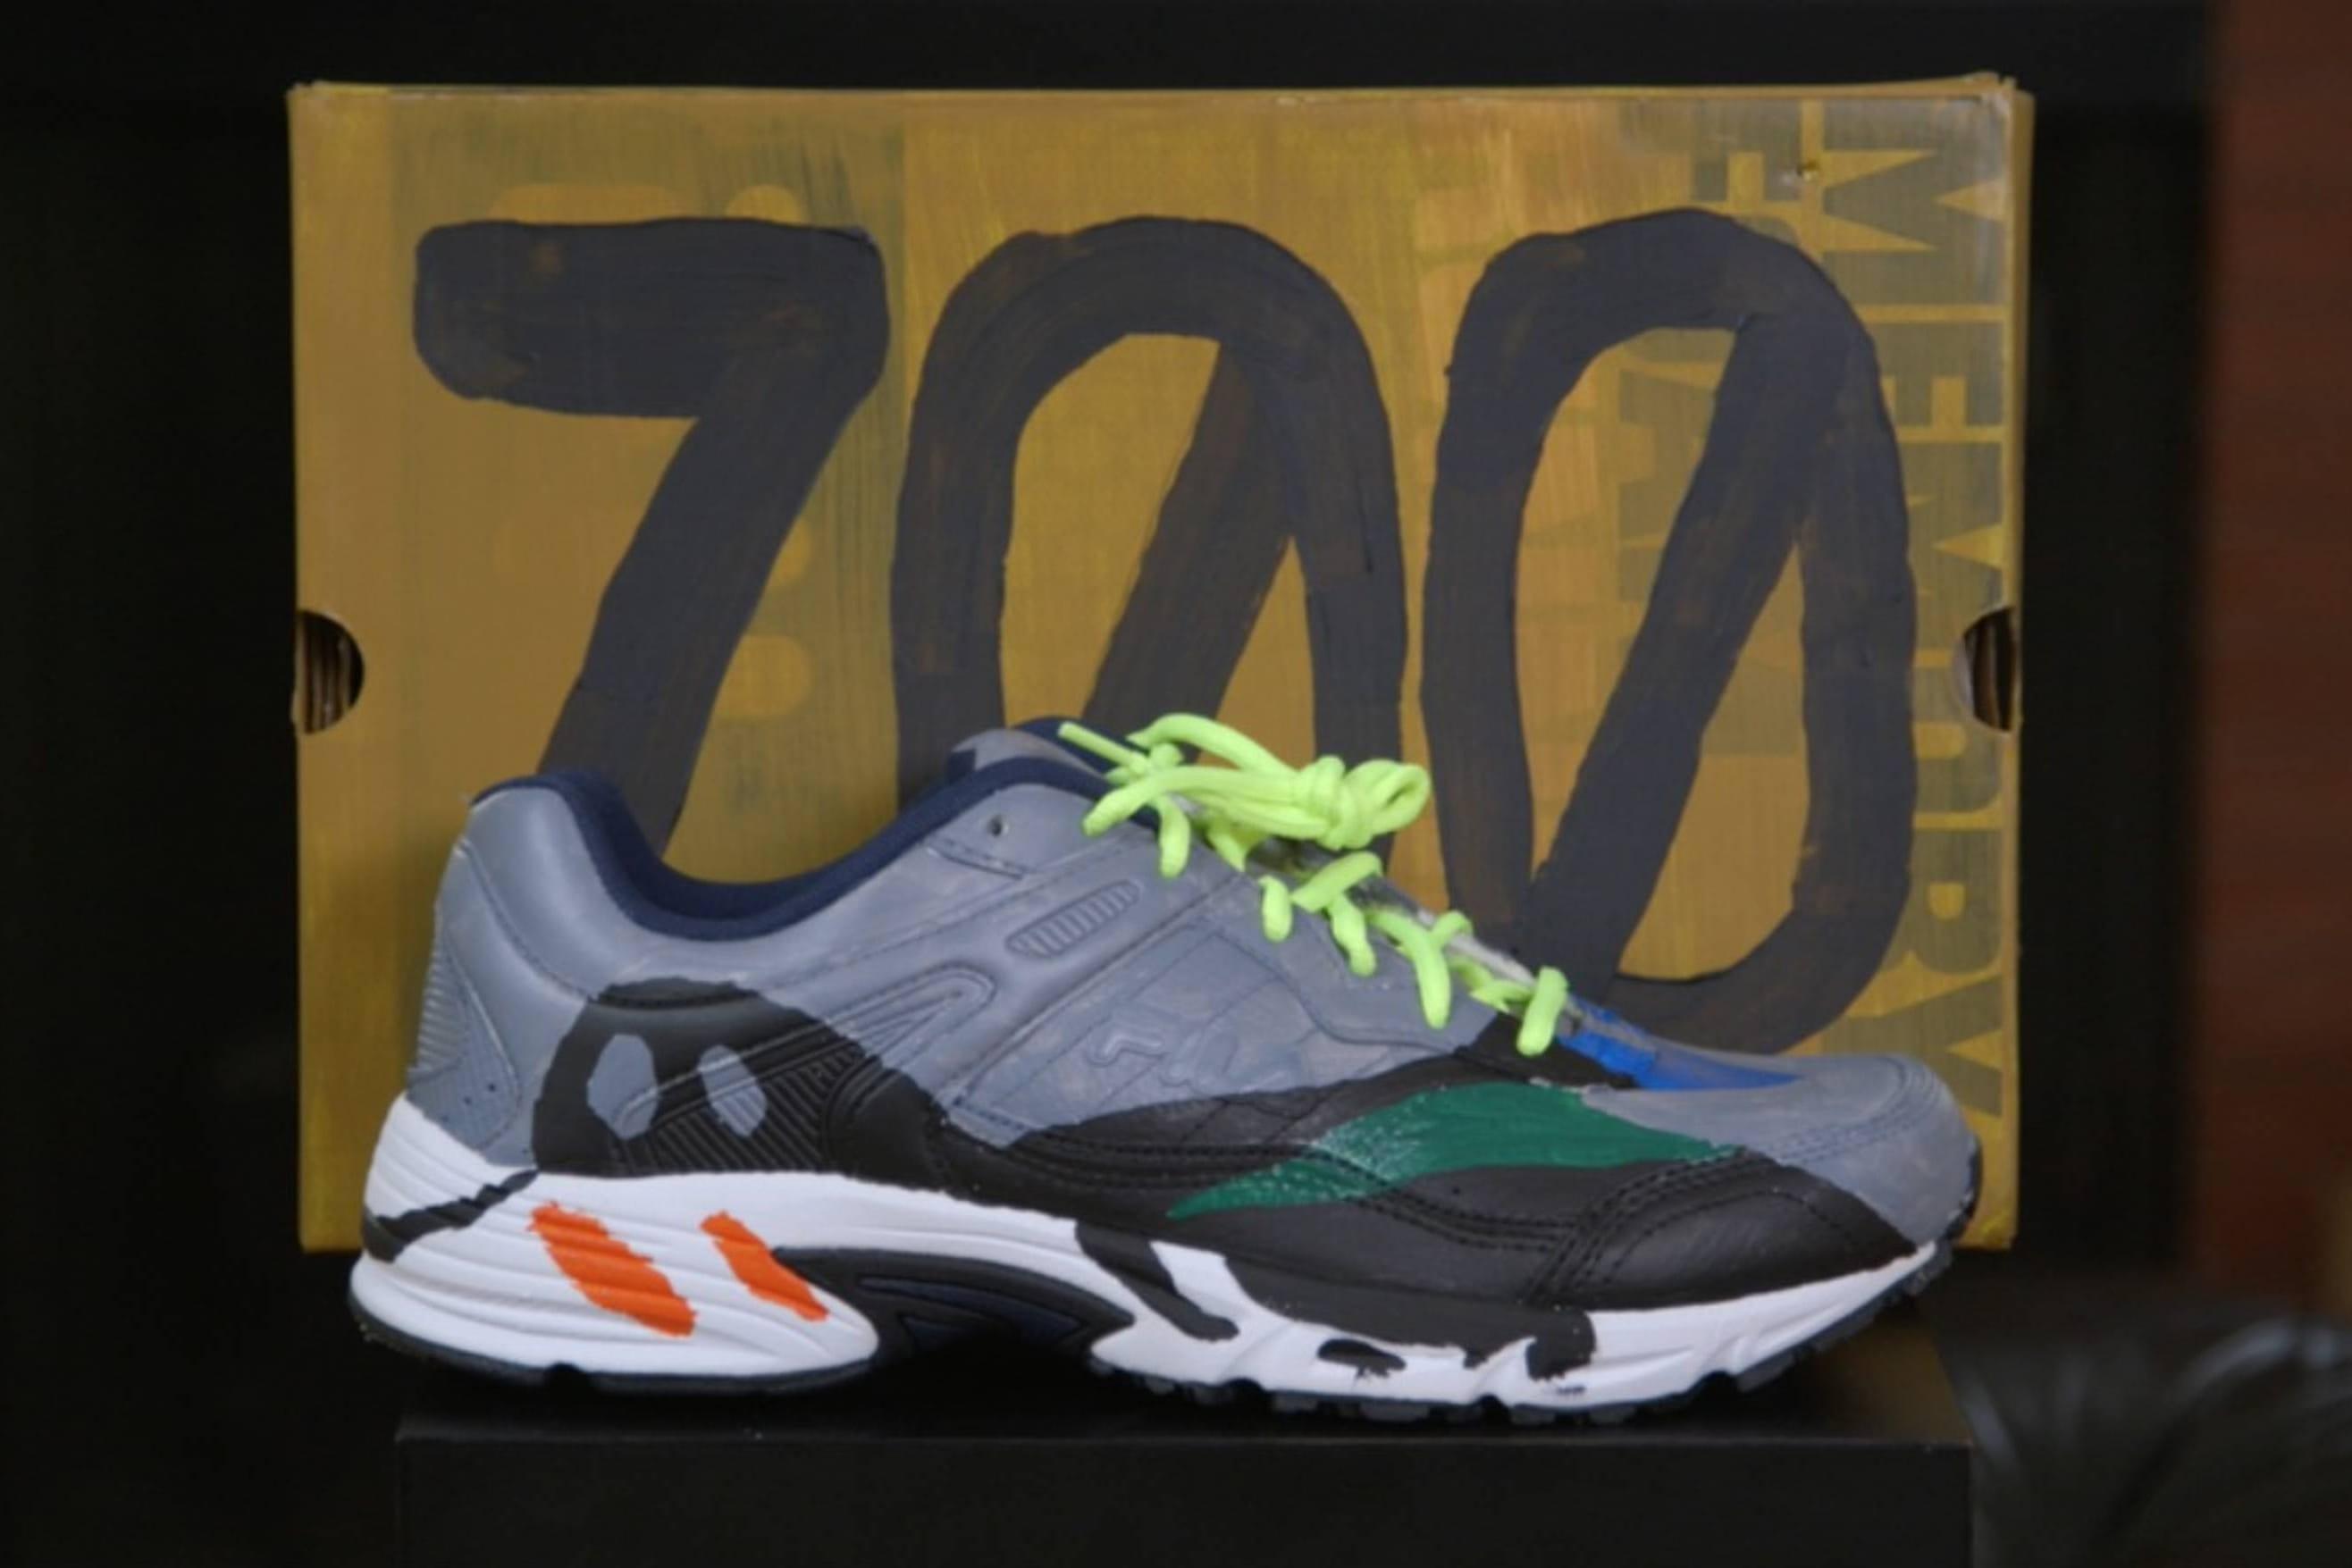 Brad Hall YEEZY Wave Runner 700 Mock-Up